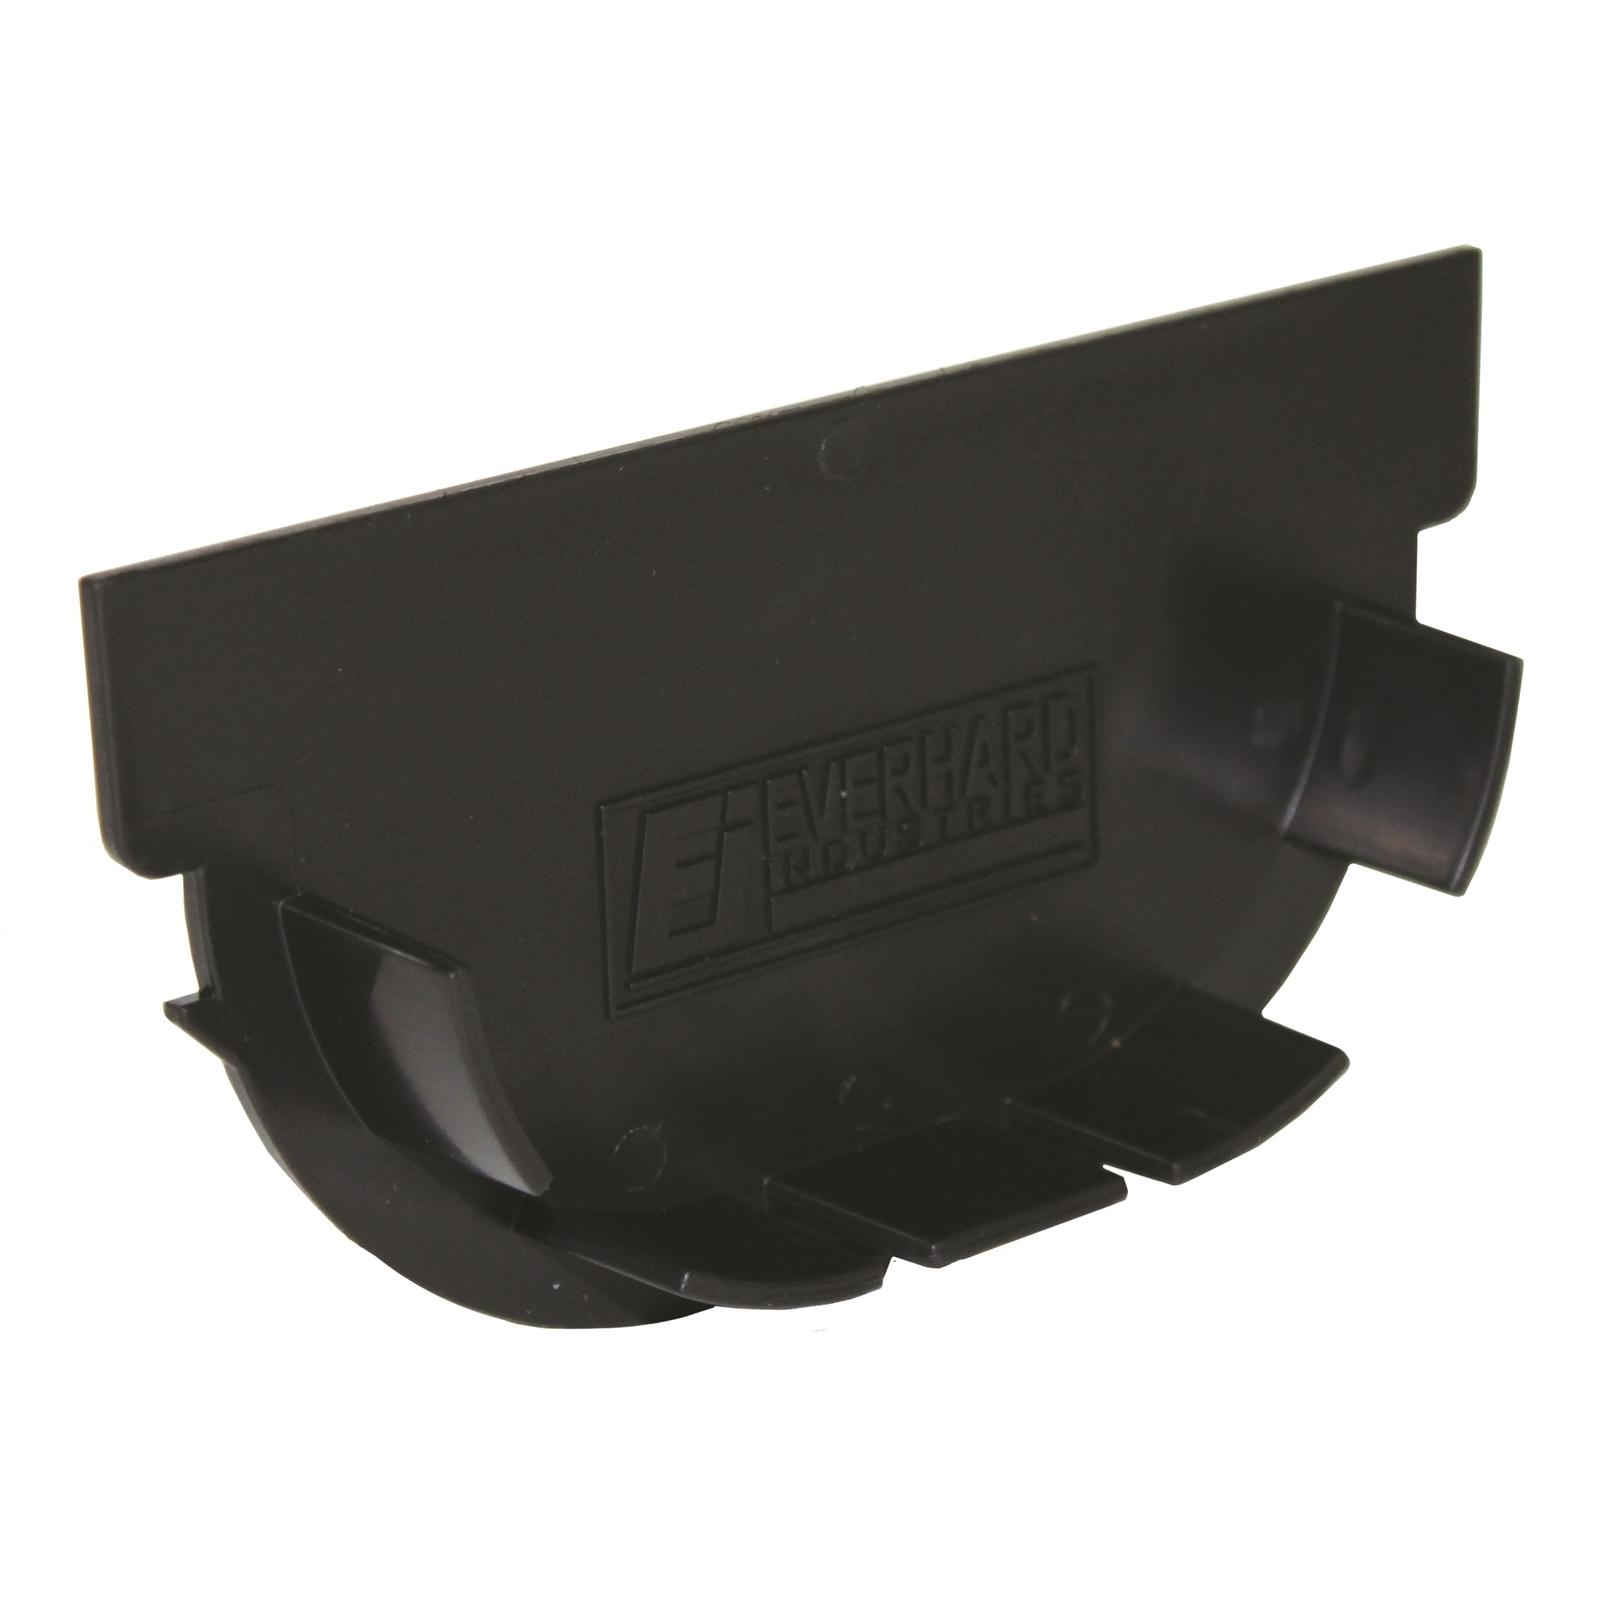 Everhard EasyDRAIN Compact End Cap